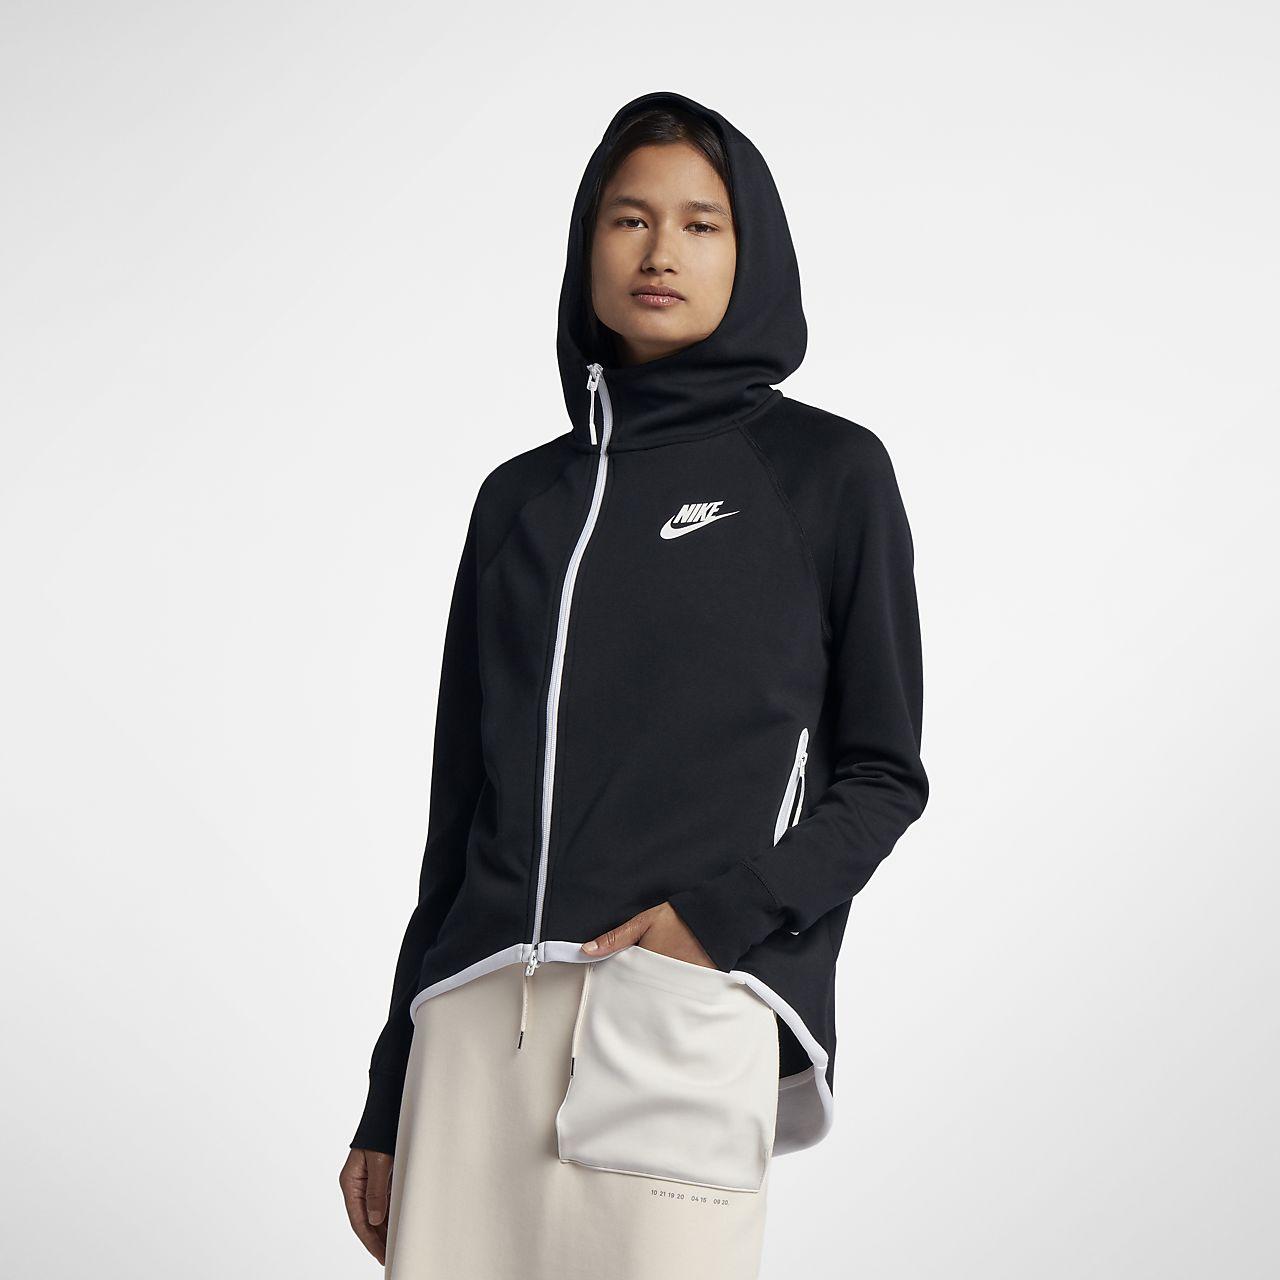 sale online best loved lowest discount Veste cape entièrement zippée Nike Sportswear Tech Fleece pour Femme